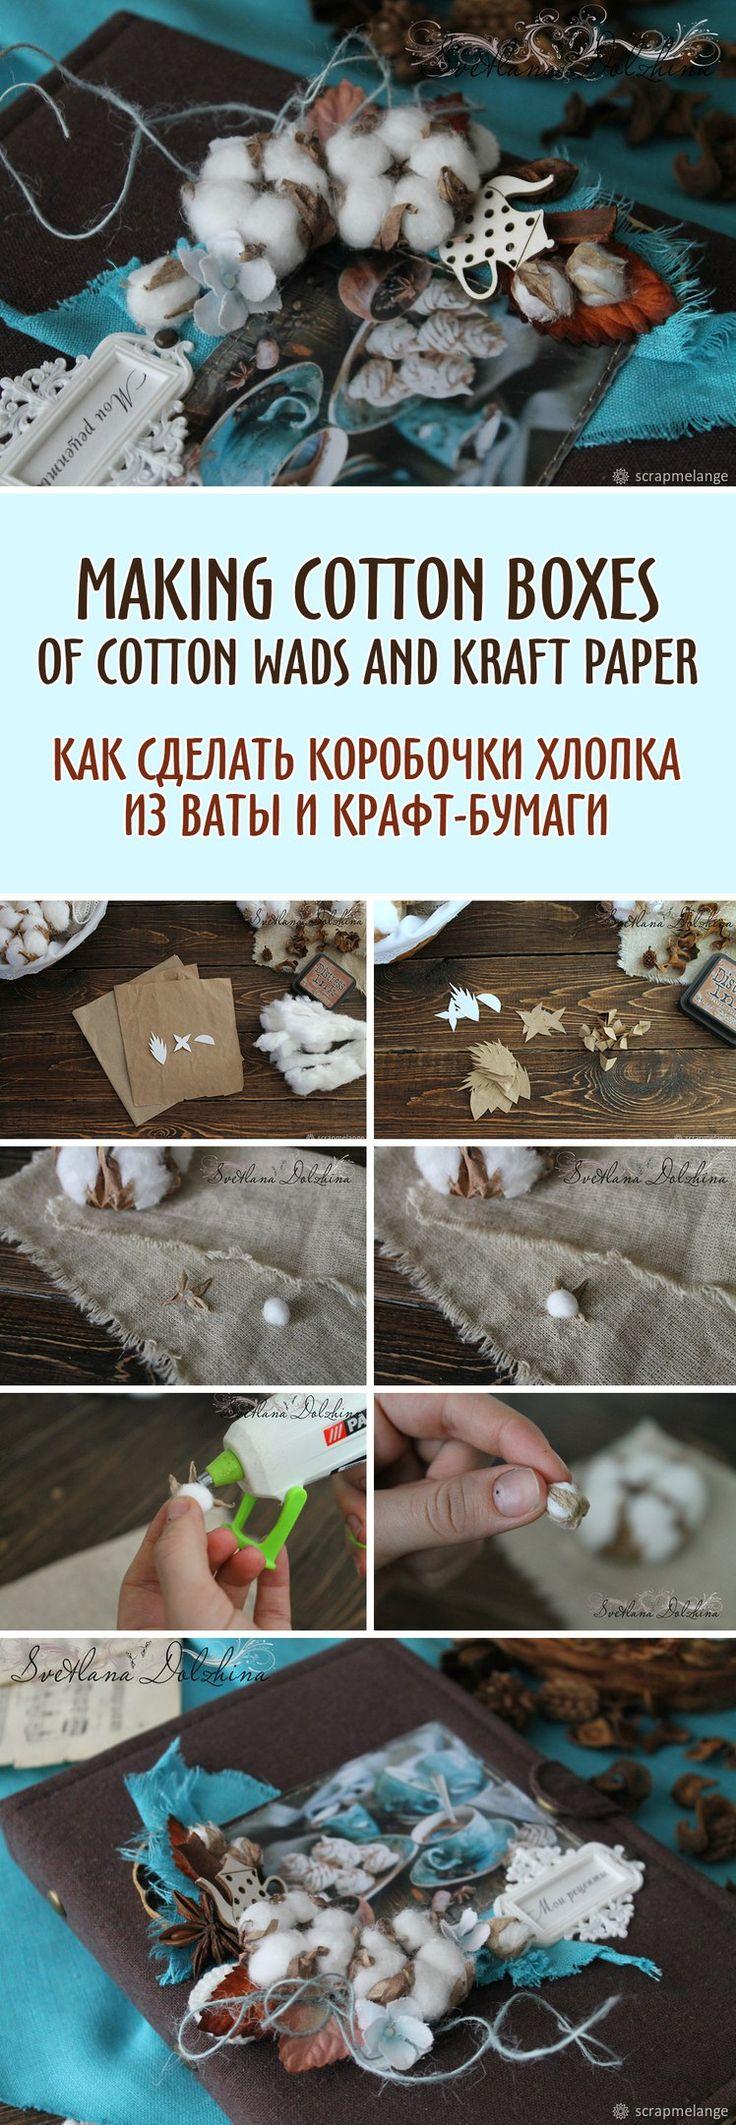 How to make cotton boxes of cotton wads and kraft paper | Как сделать коробочки хлопка из ваты и крафт-бумаги